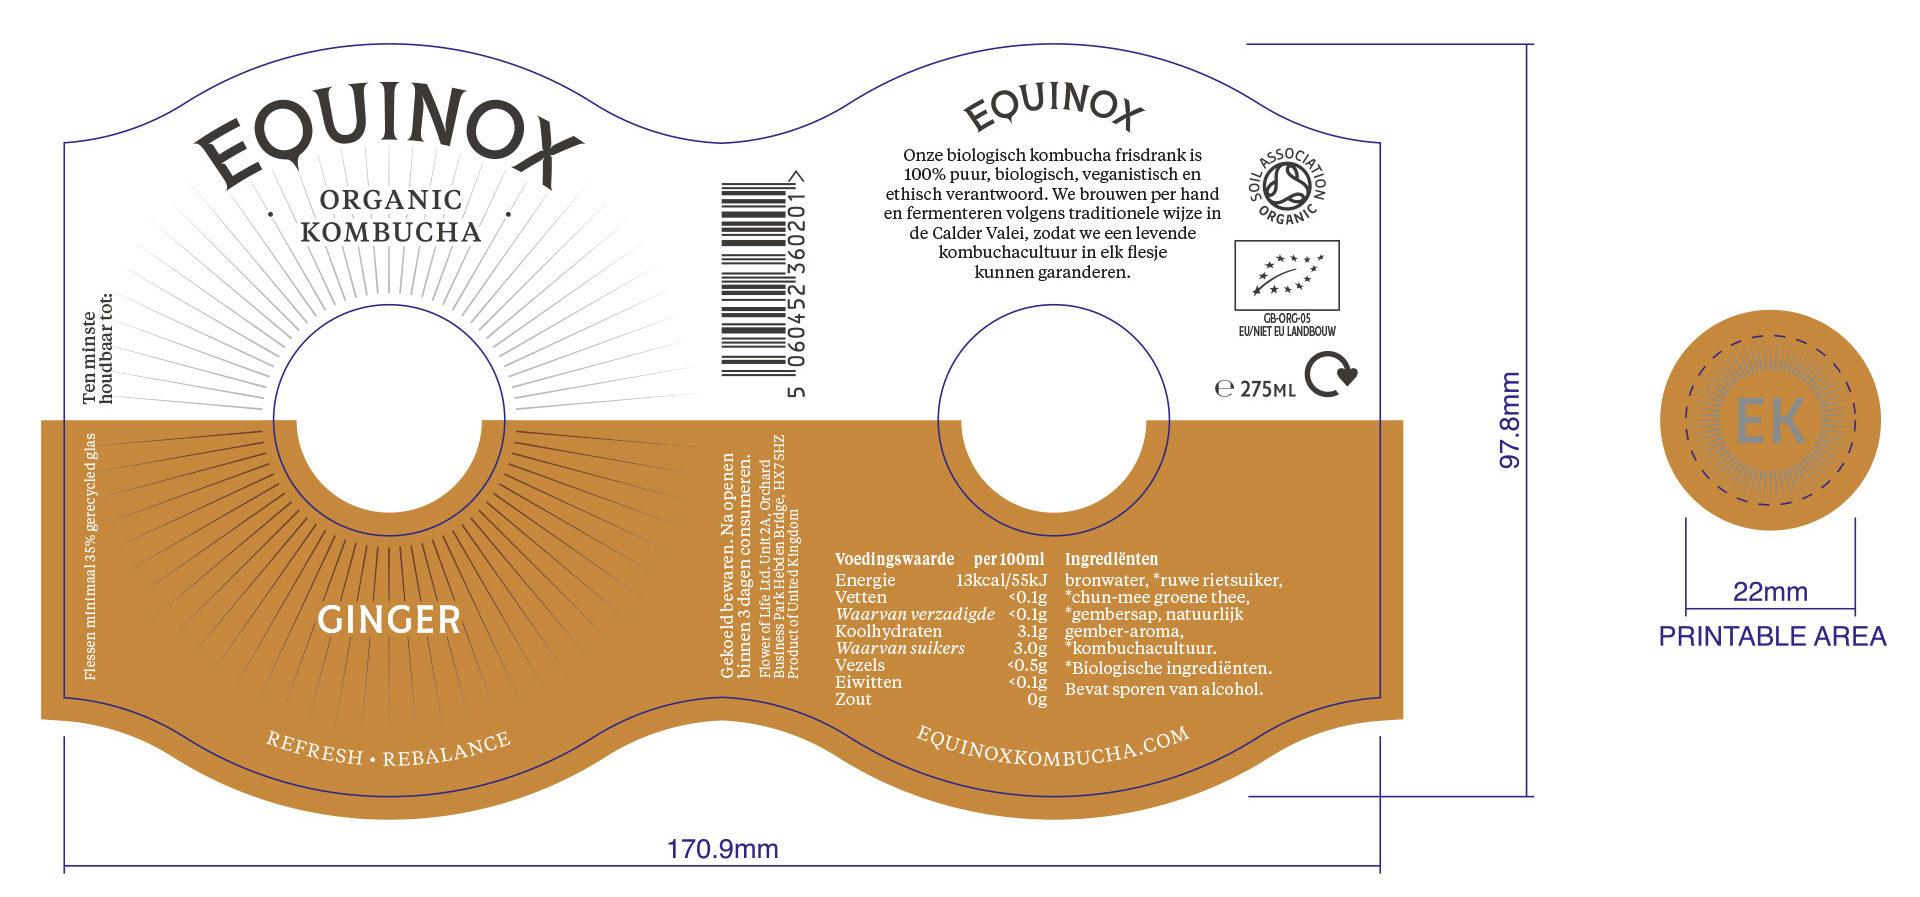 packaging-artwork-repro-drink-bottle-equinox